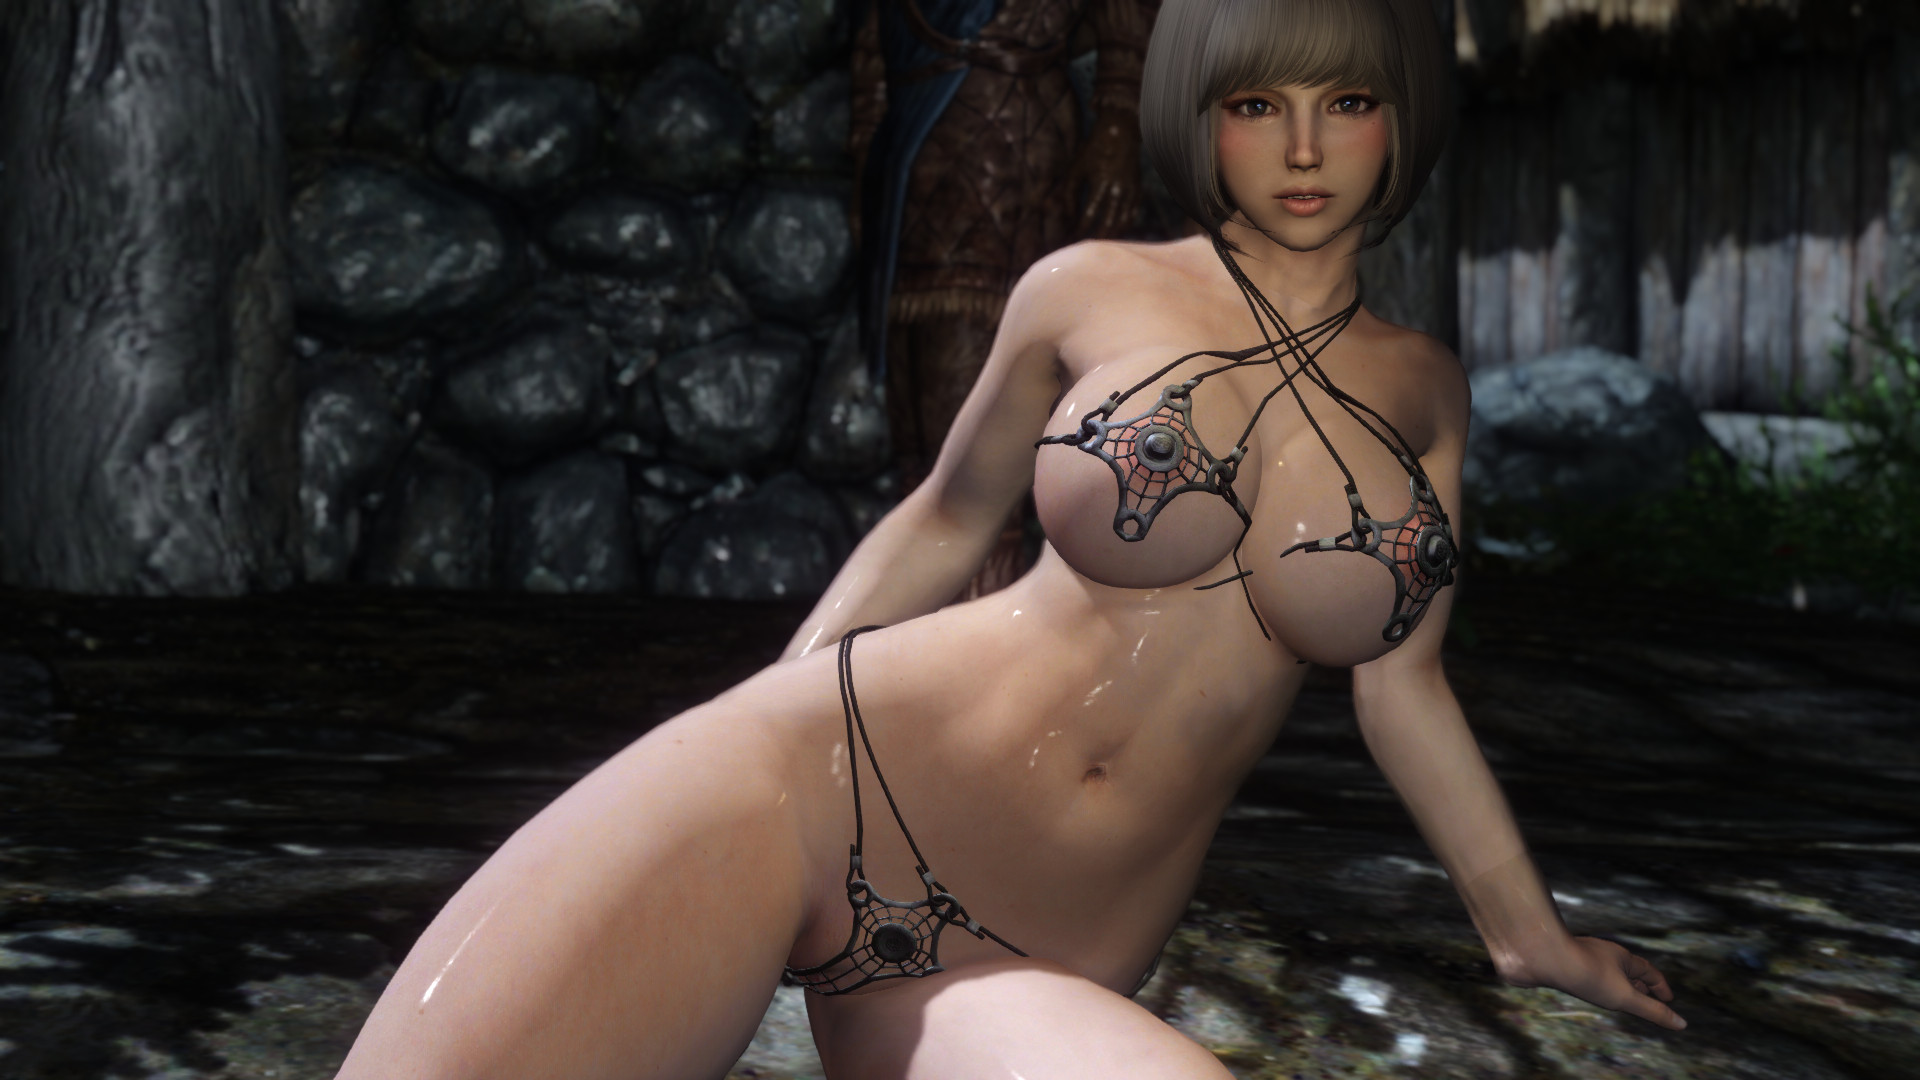 sexlab animations